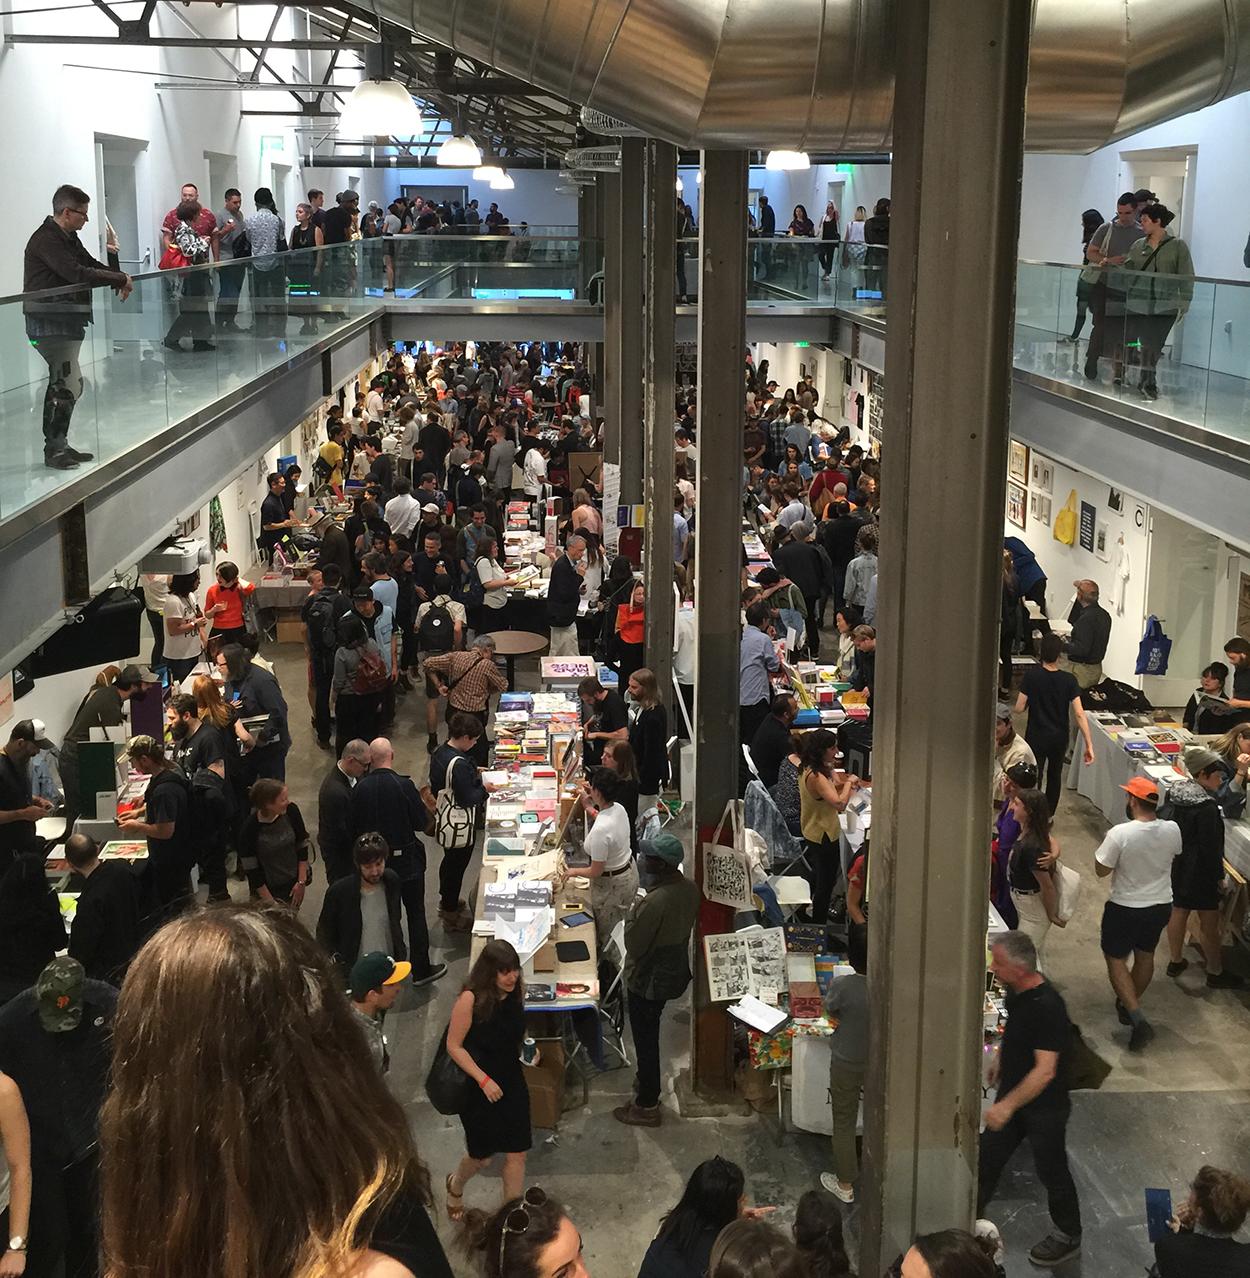 San Francisco Art Book Fair, Minnesota Street Project, San Francisco, CA, July, 2016. http://www.parklifestore.com/